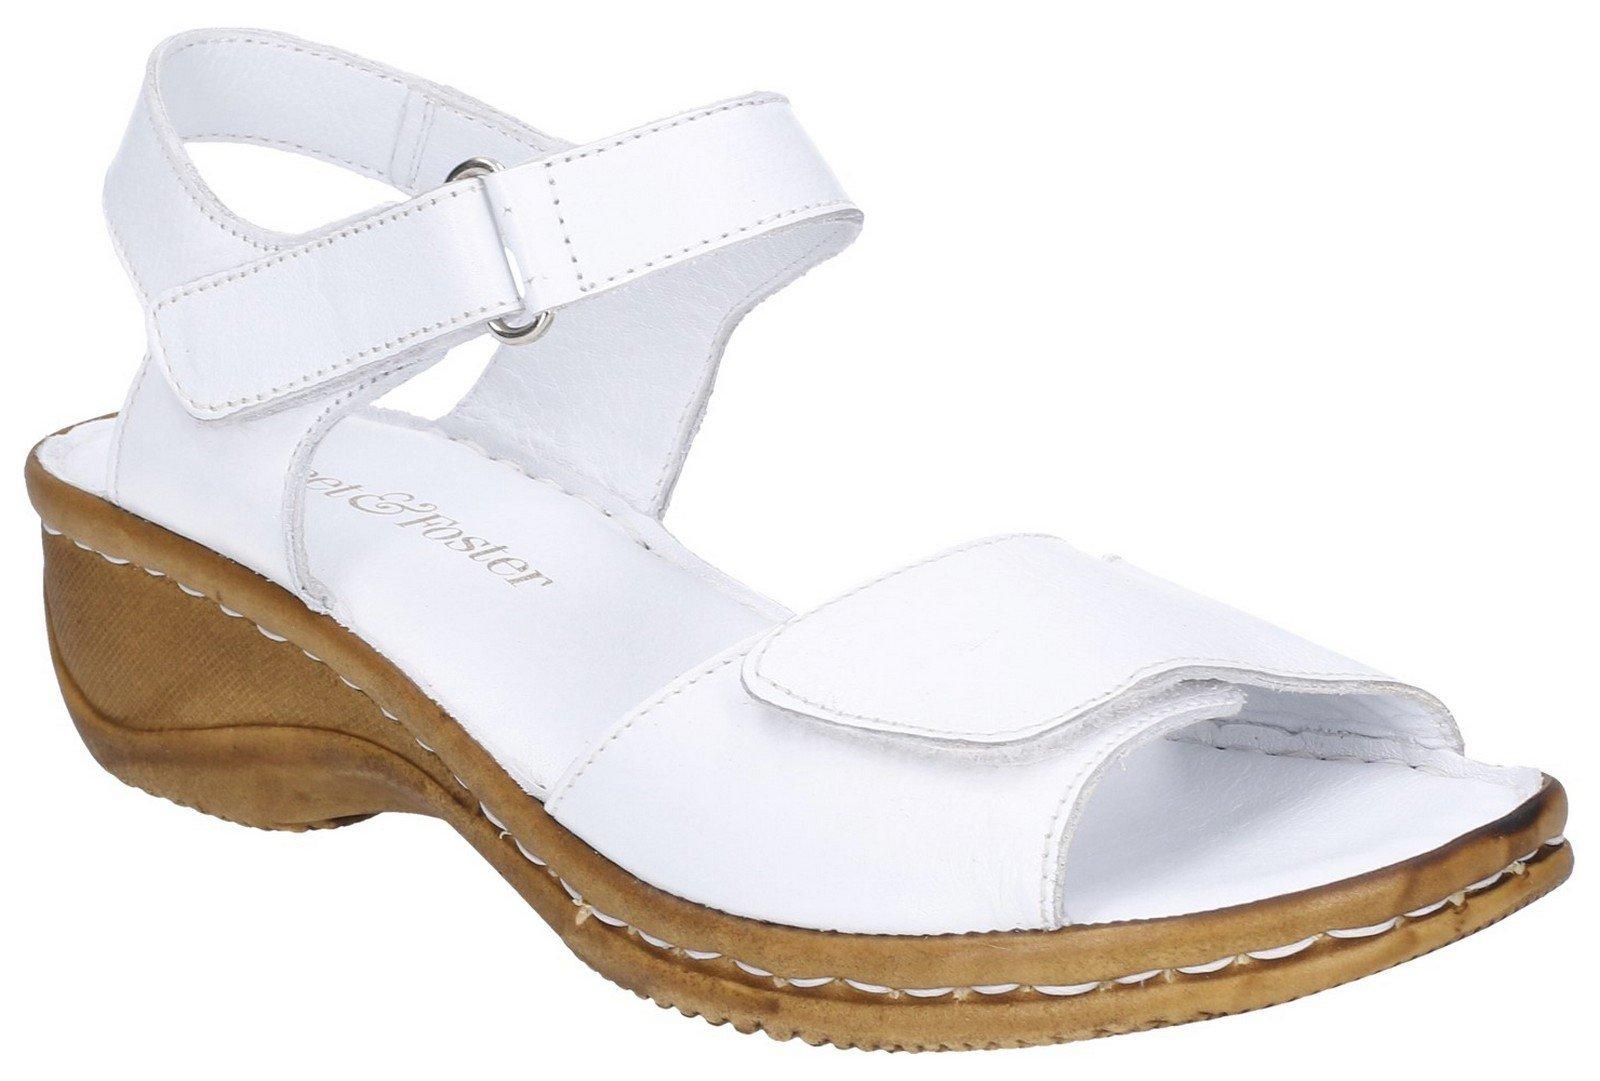 Fleet & Foster Women's Linden Touch Sandal Various Colours 28274 - White 8